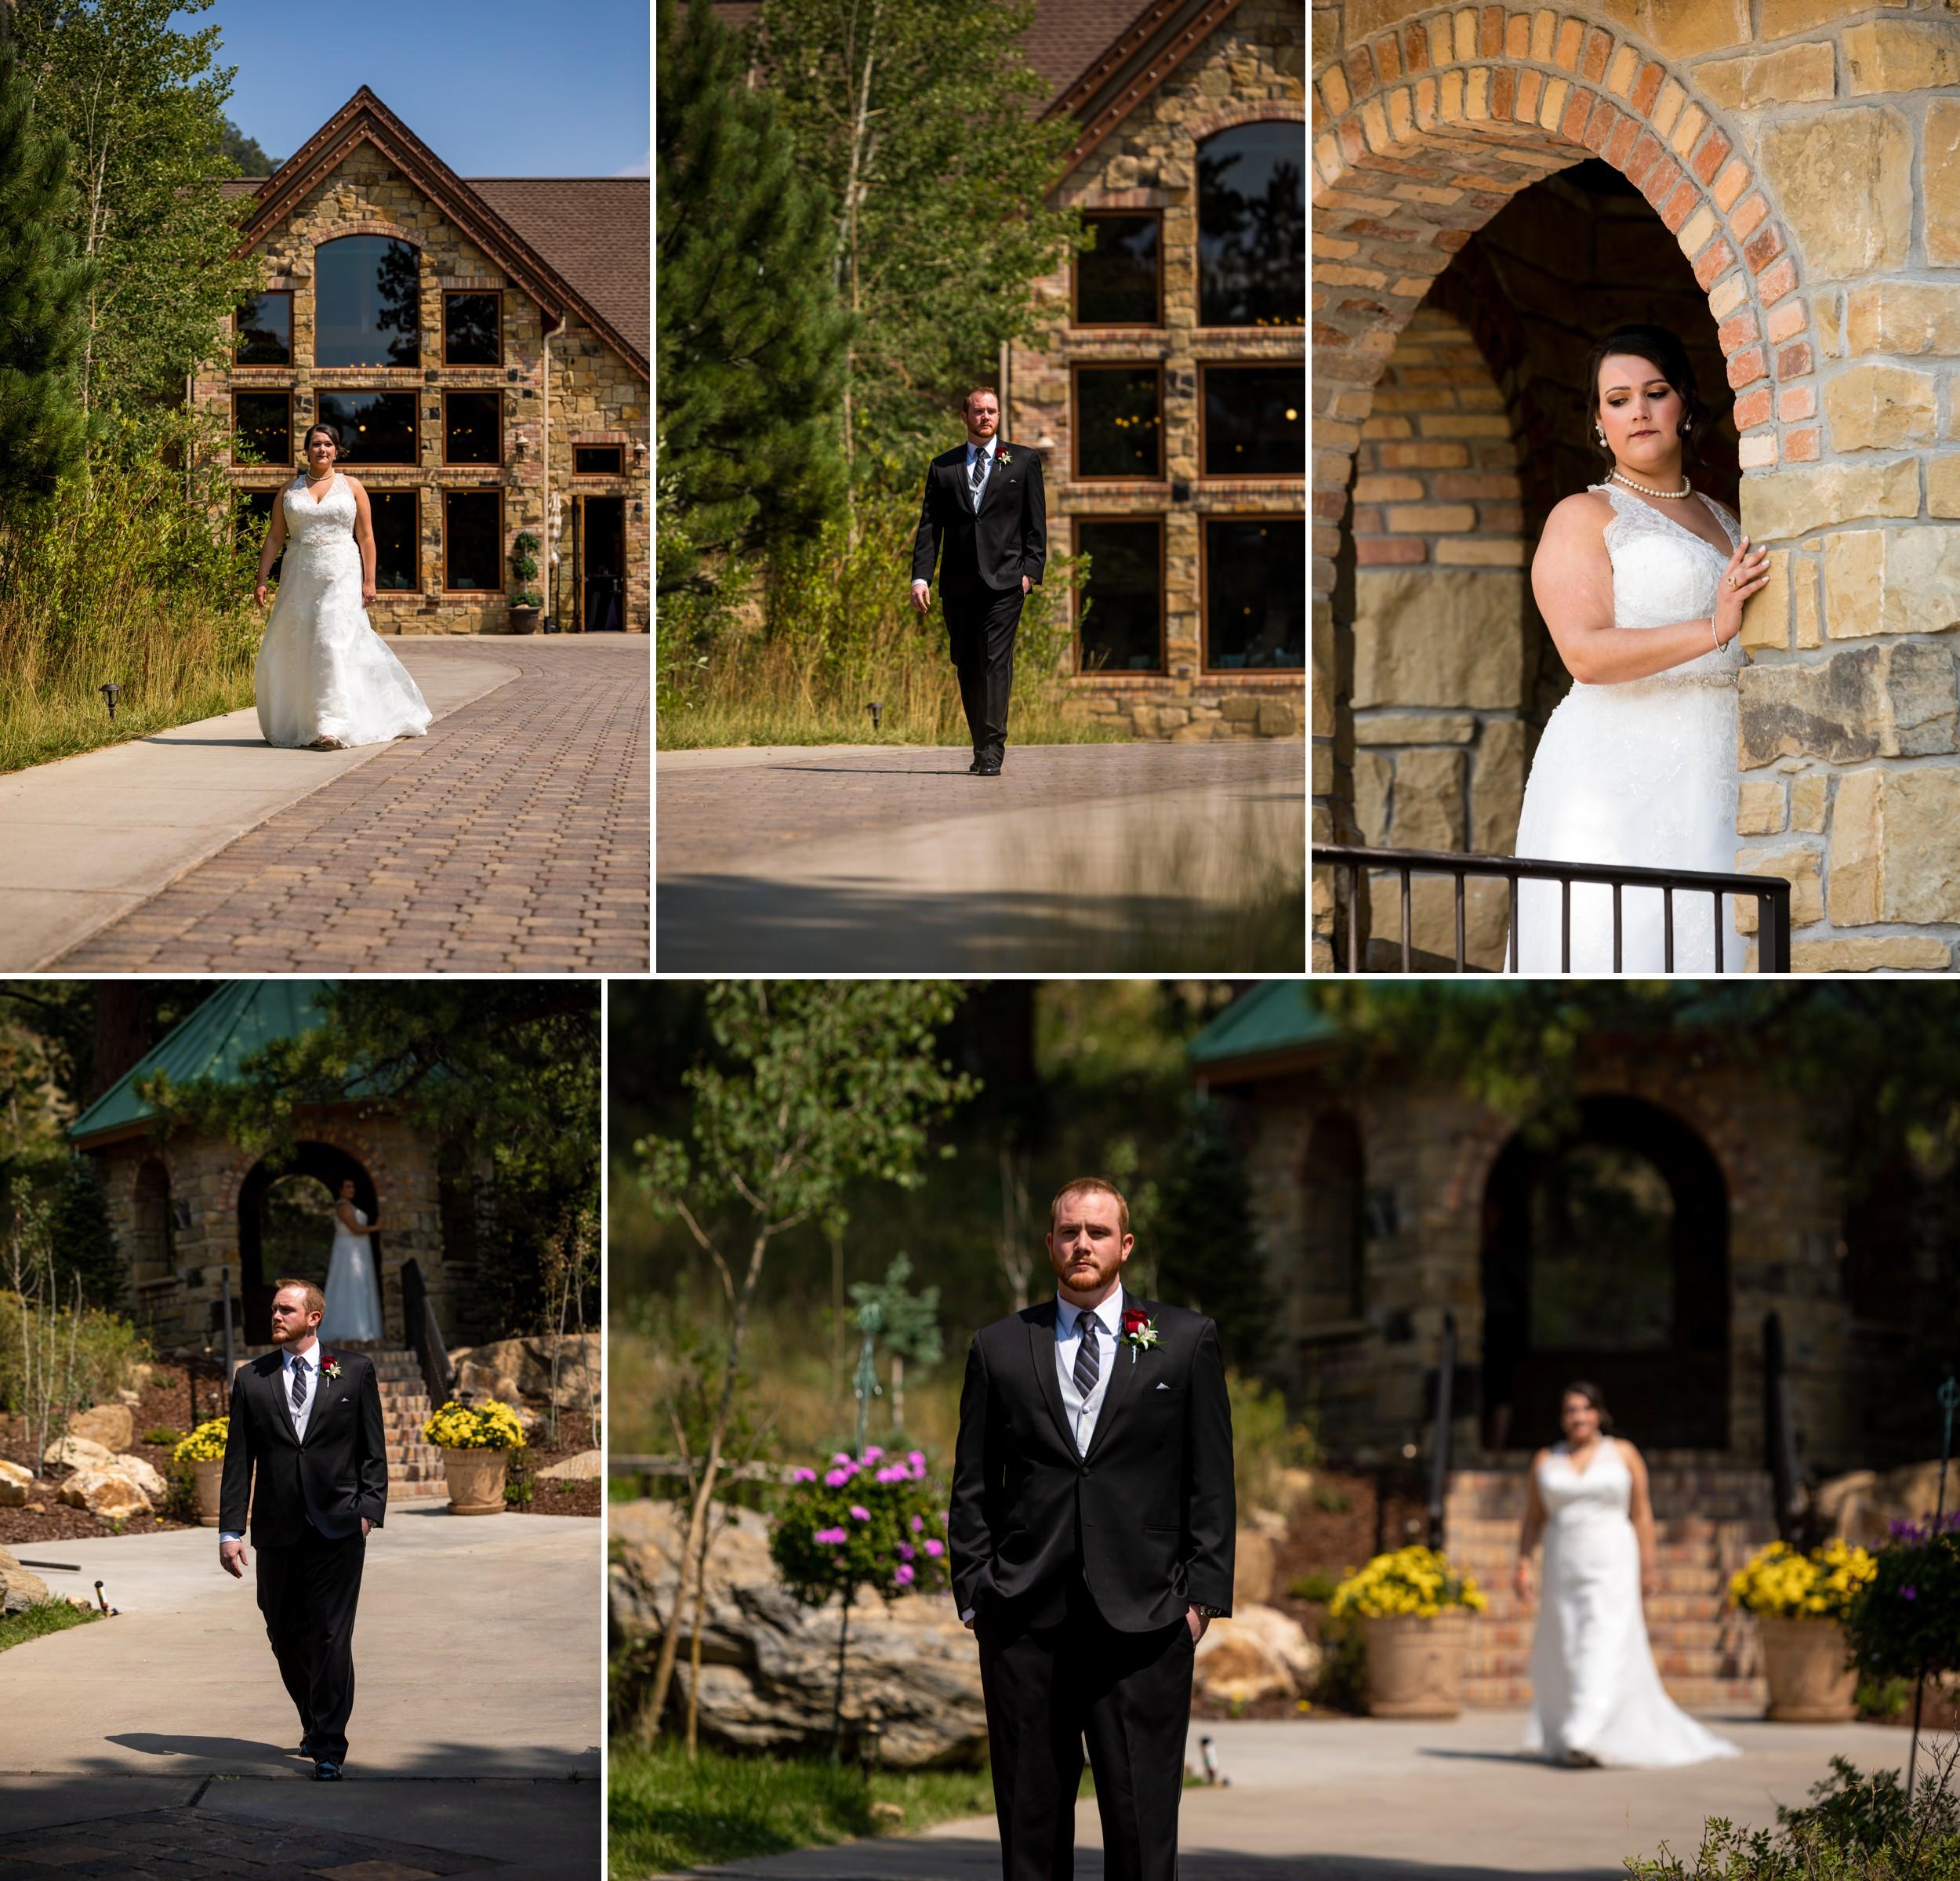 Della Terra Mountain Chateau, Estes Park Colorado Wedding